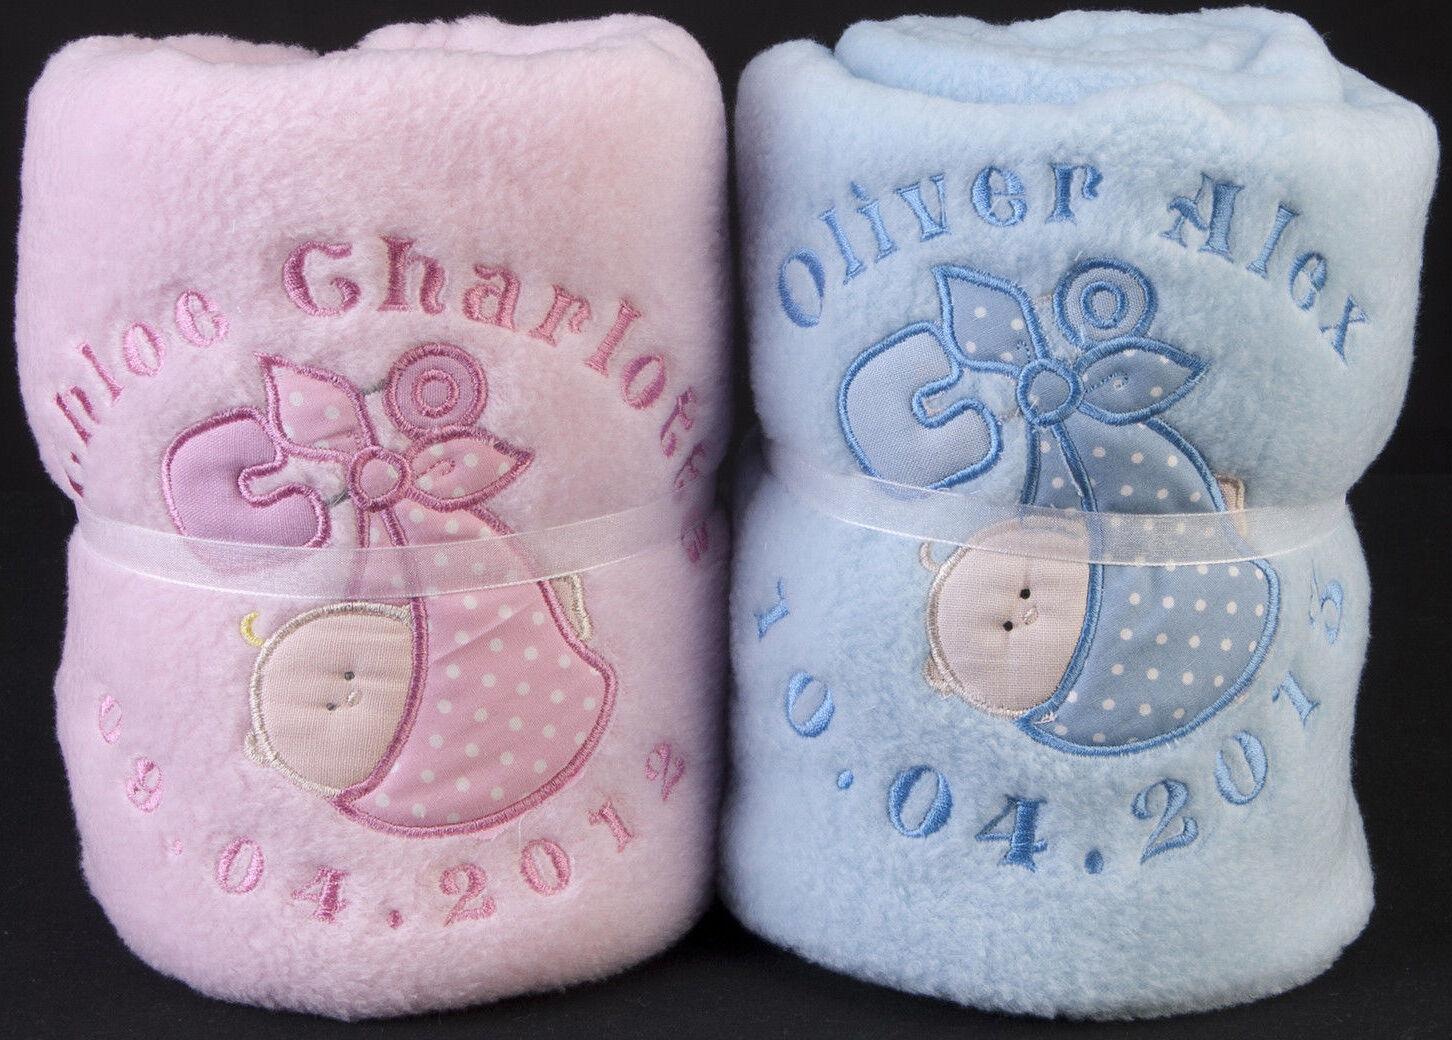 Top 10 Christening Gifts for Girls   eBay